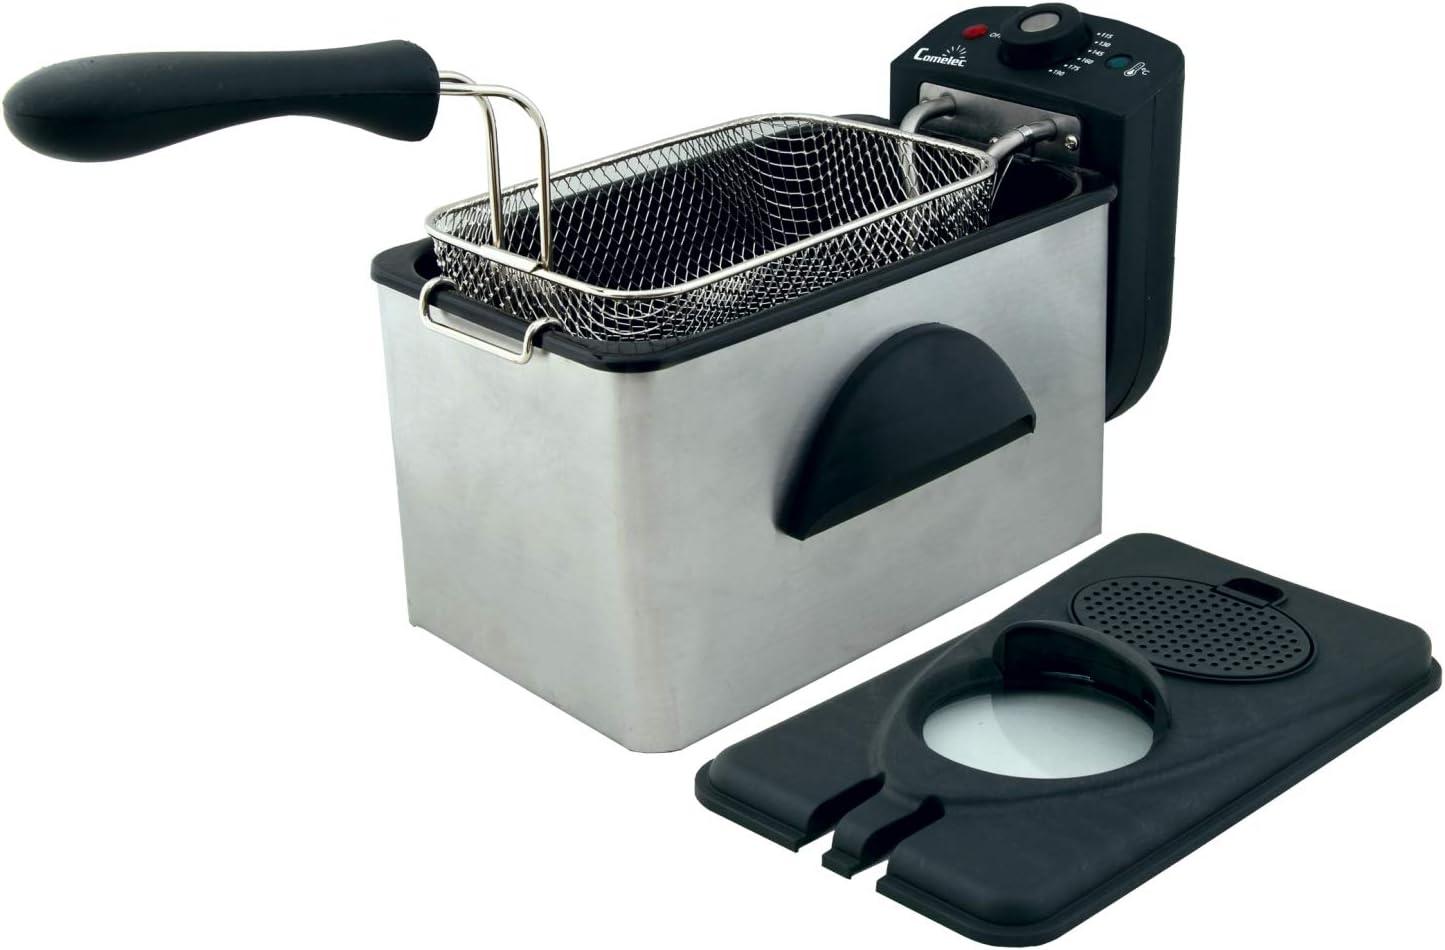 Comelec FR 3082 Freidora eléctrica, 2000 W, Blanco/Negro: Amazon.es